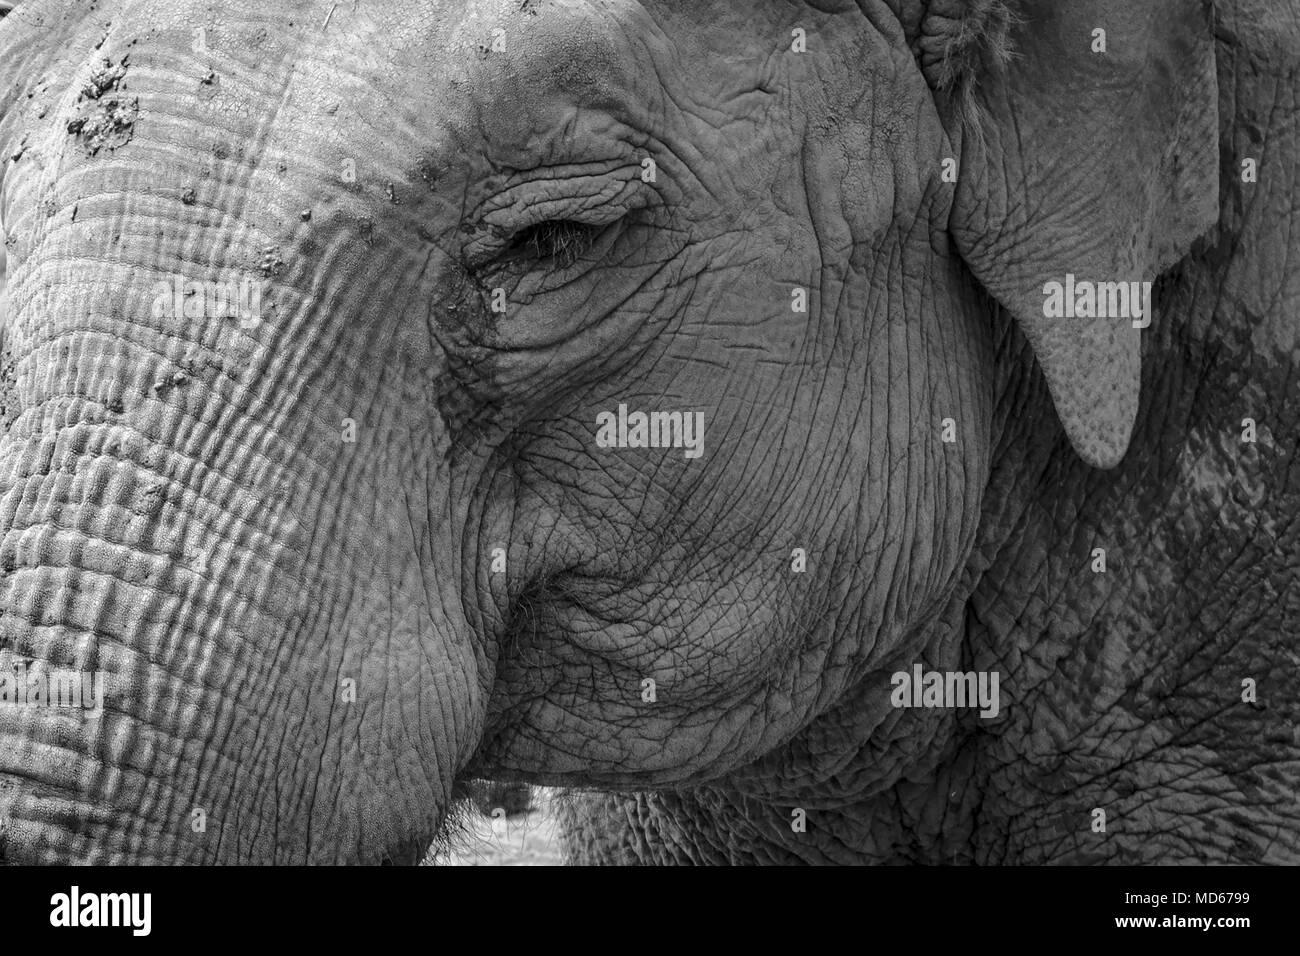 black white elephant in zoo - Stock Image